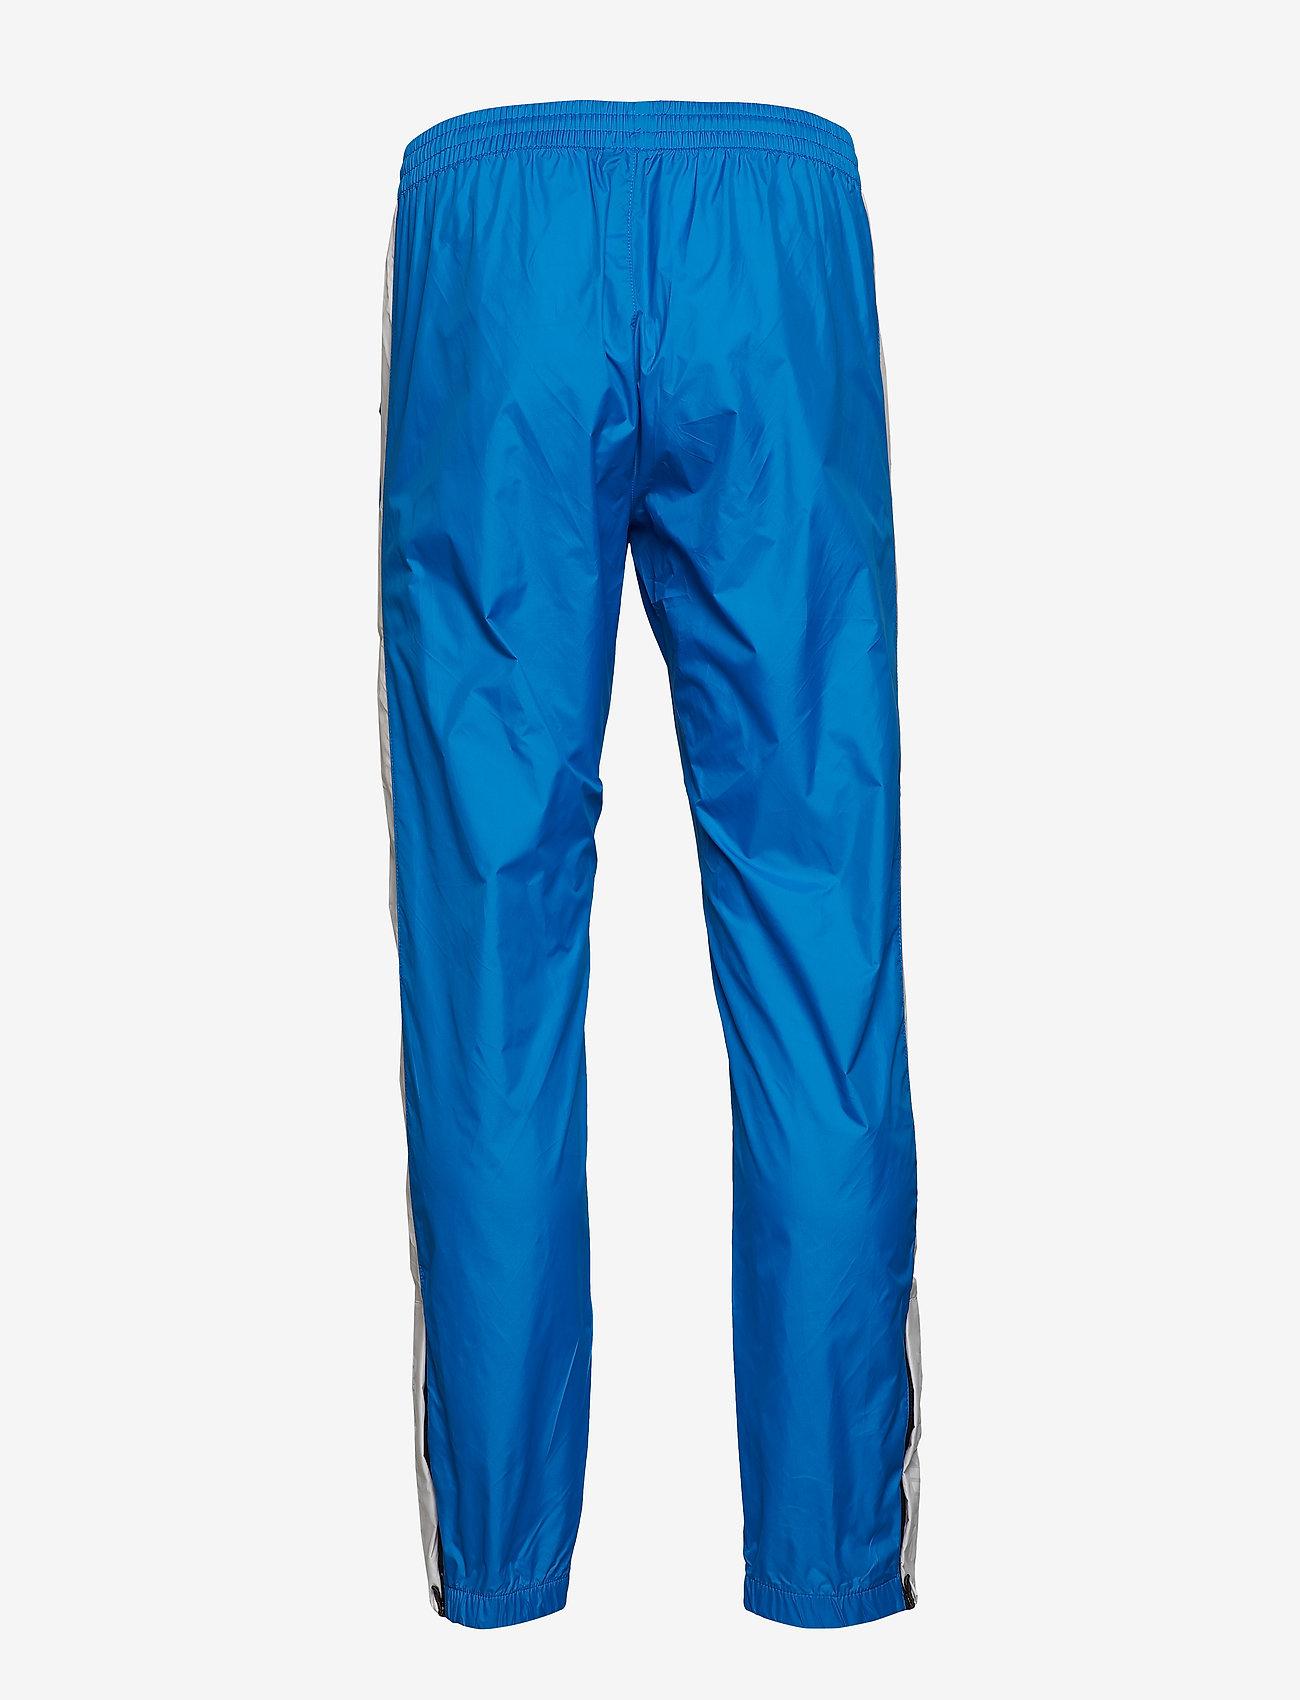 Newline - BLACK TRACK PANTS - spodnie treningowe - bright blue - 1